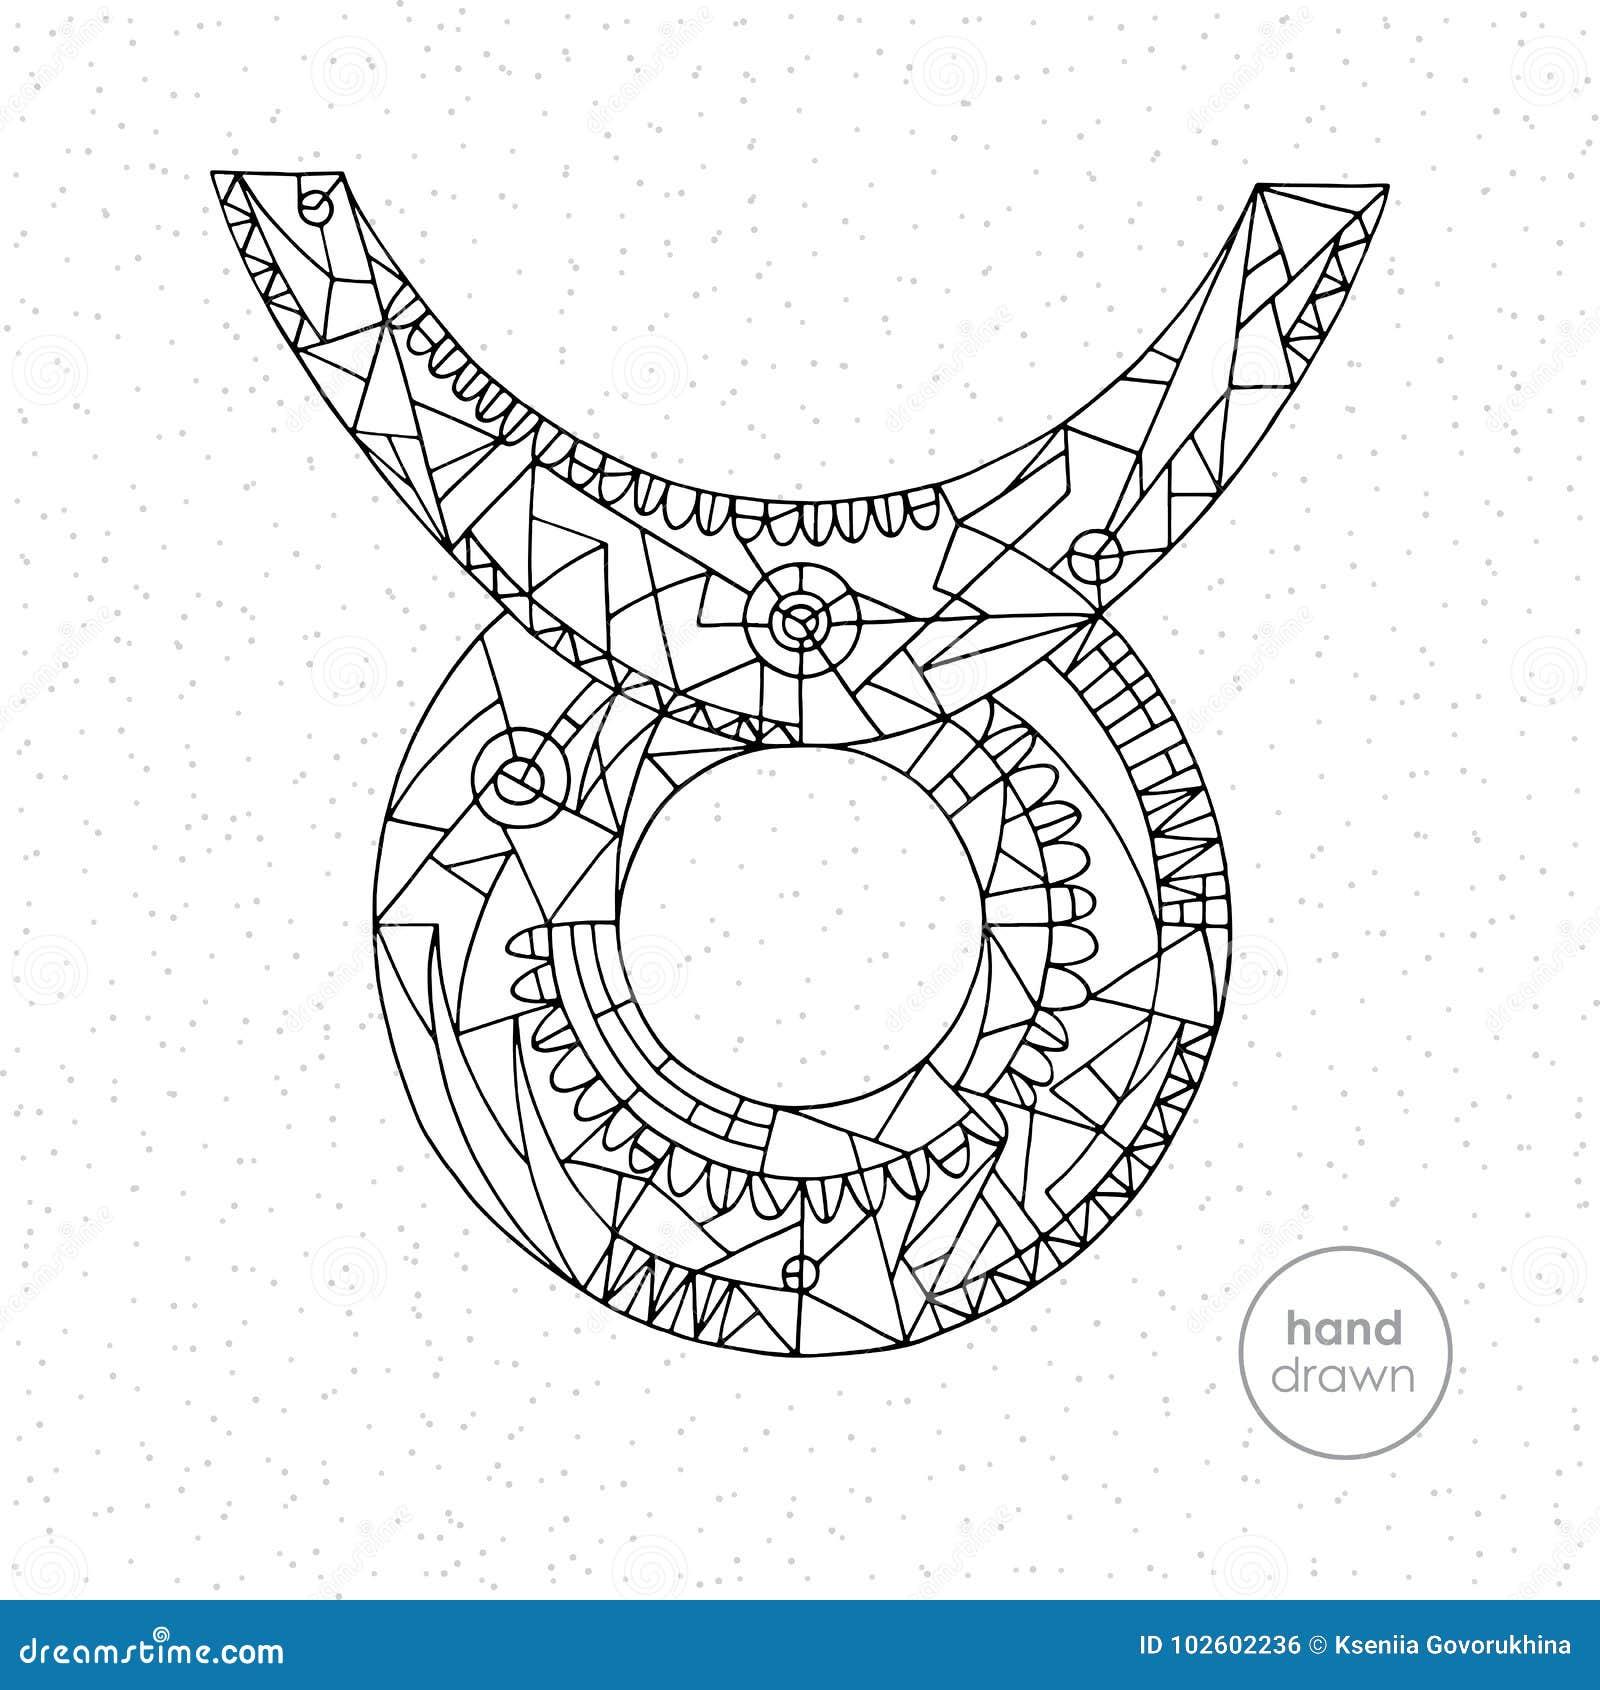 Taurus Zodiac Sign Vector Hand Drawn Horoscope Illustration